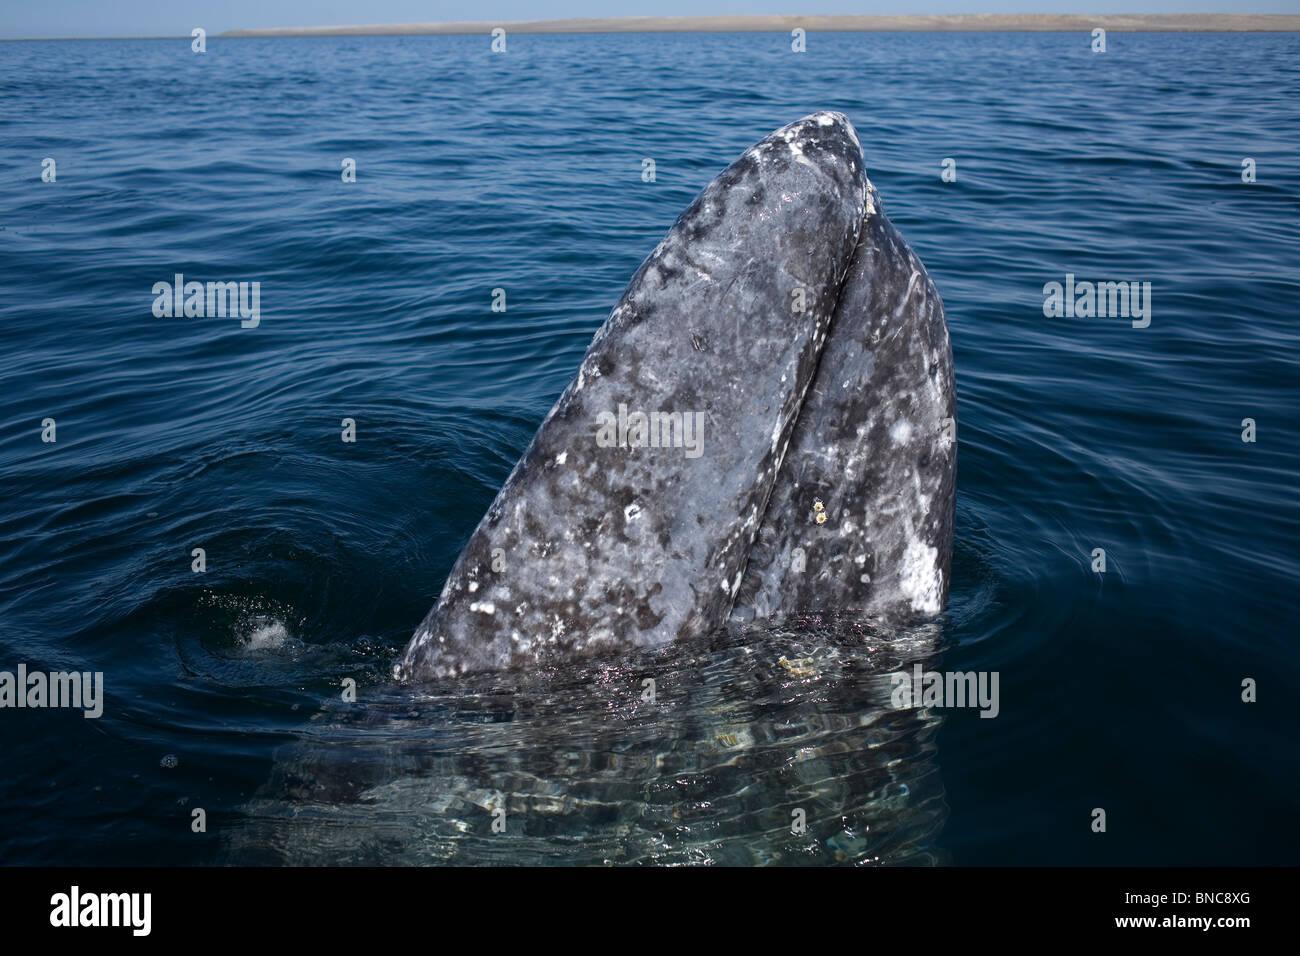 A gray whale swims in Ojo de Liebre Lagoon near the town of Guerrero Negro in Mexico's southern Baja California - Stock Image